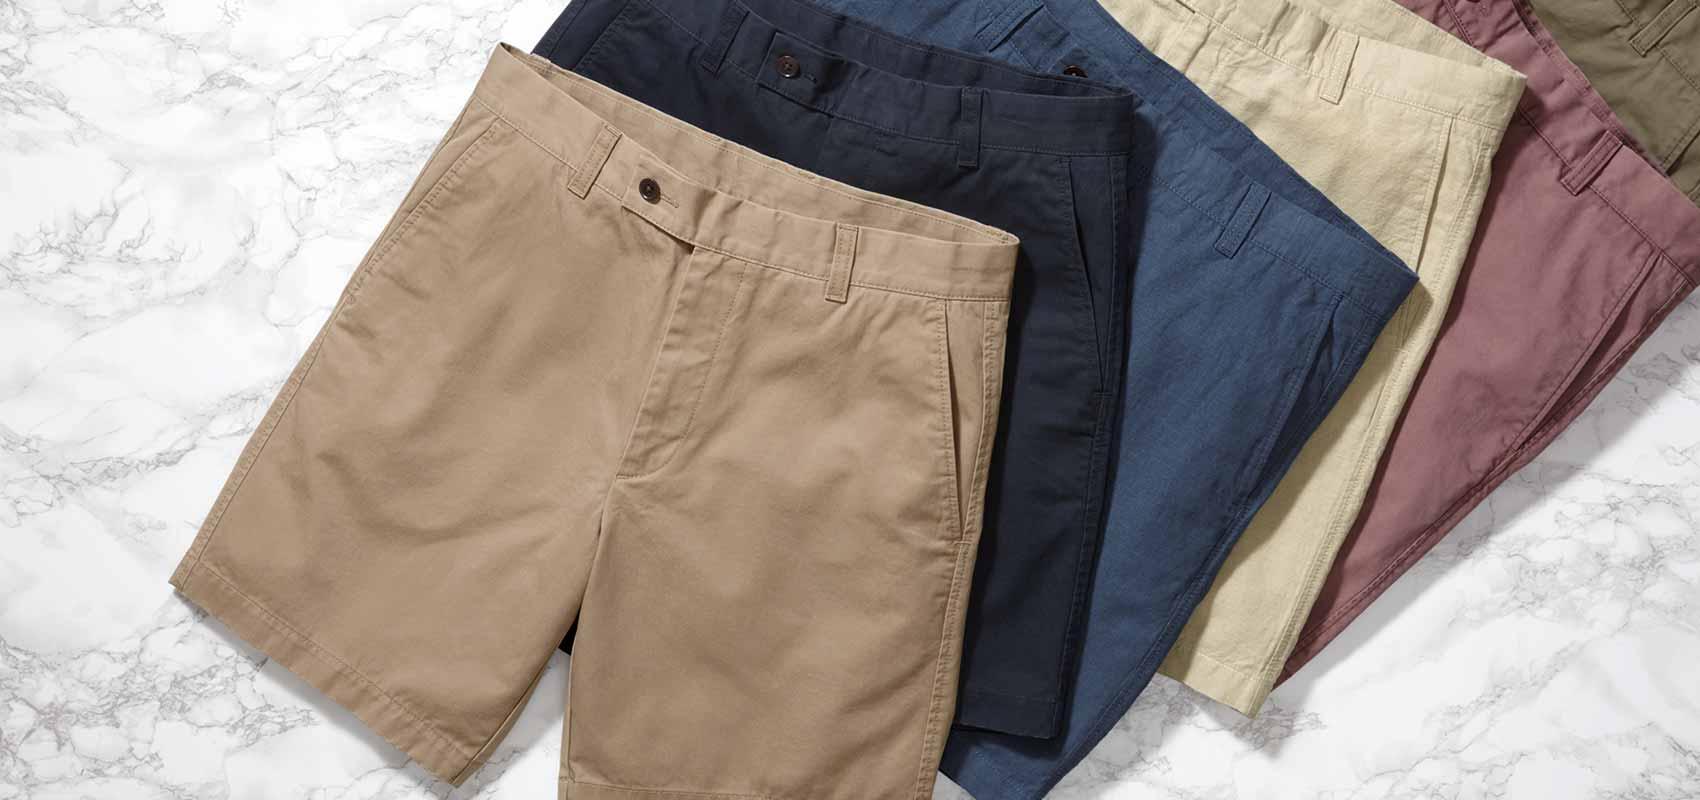 Charles Tyrwhitt shorts